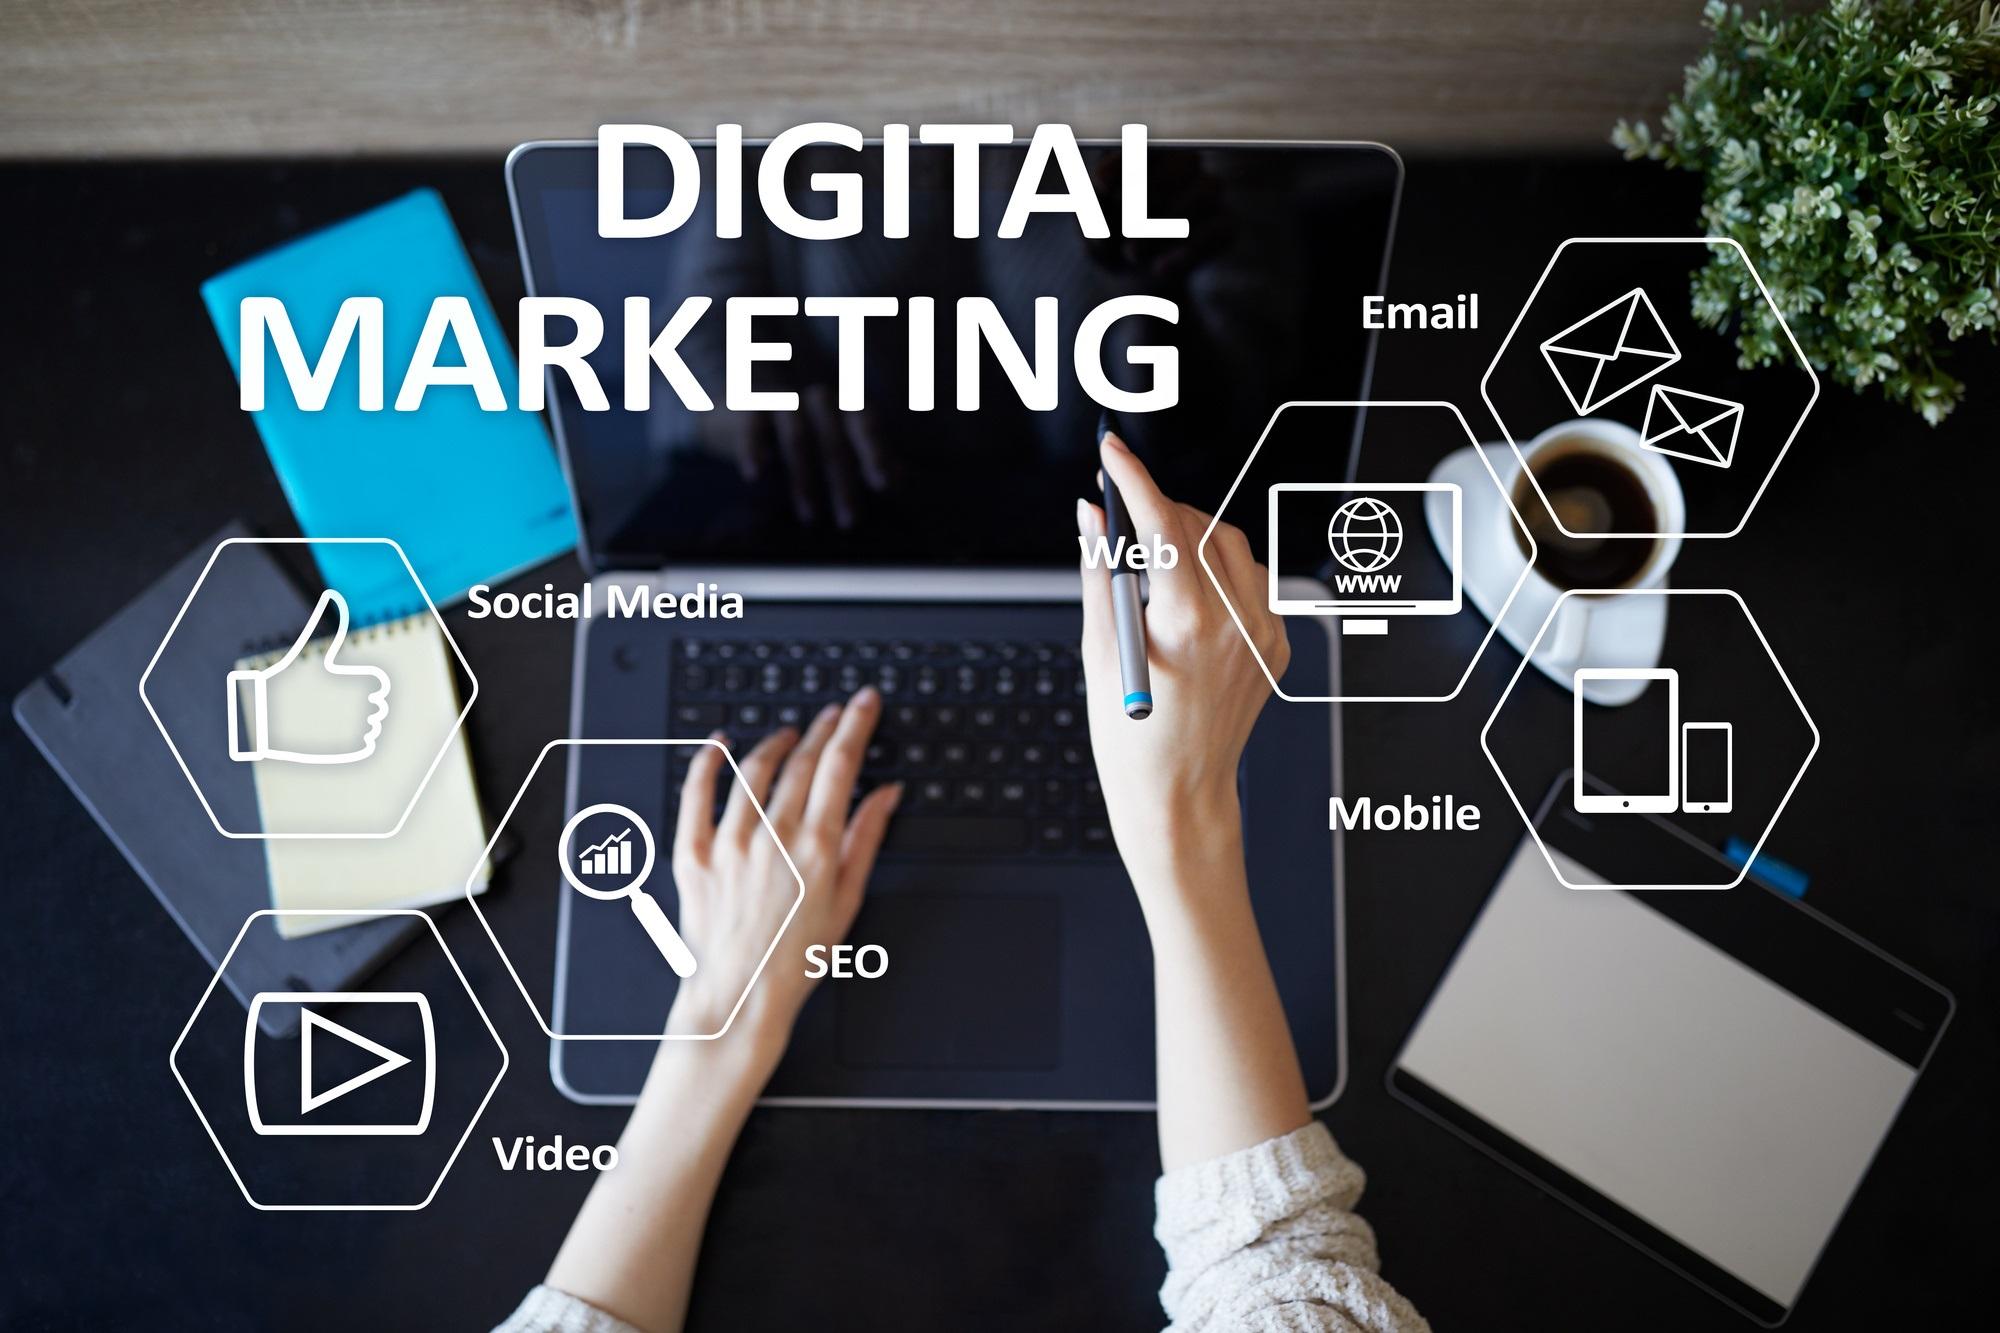 5 Digital Marketing Strategies That Actually Work